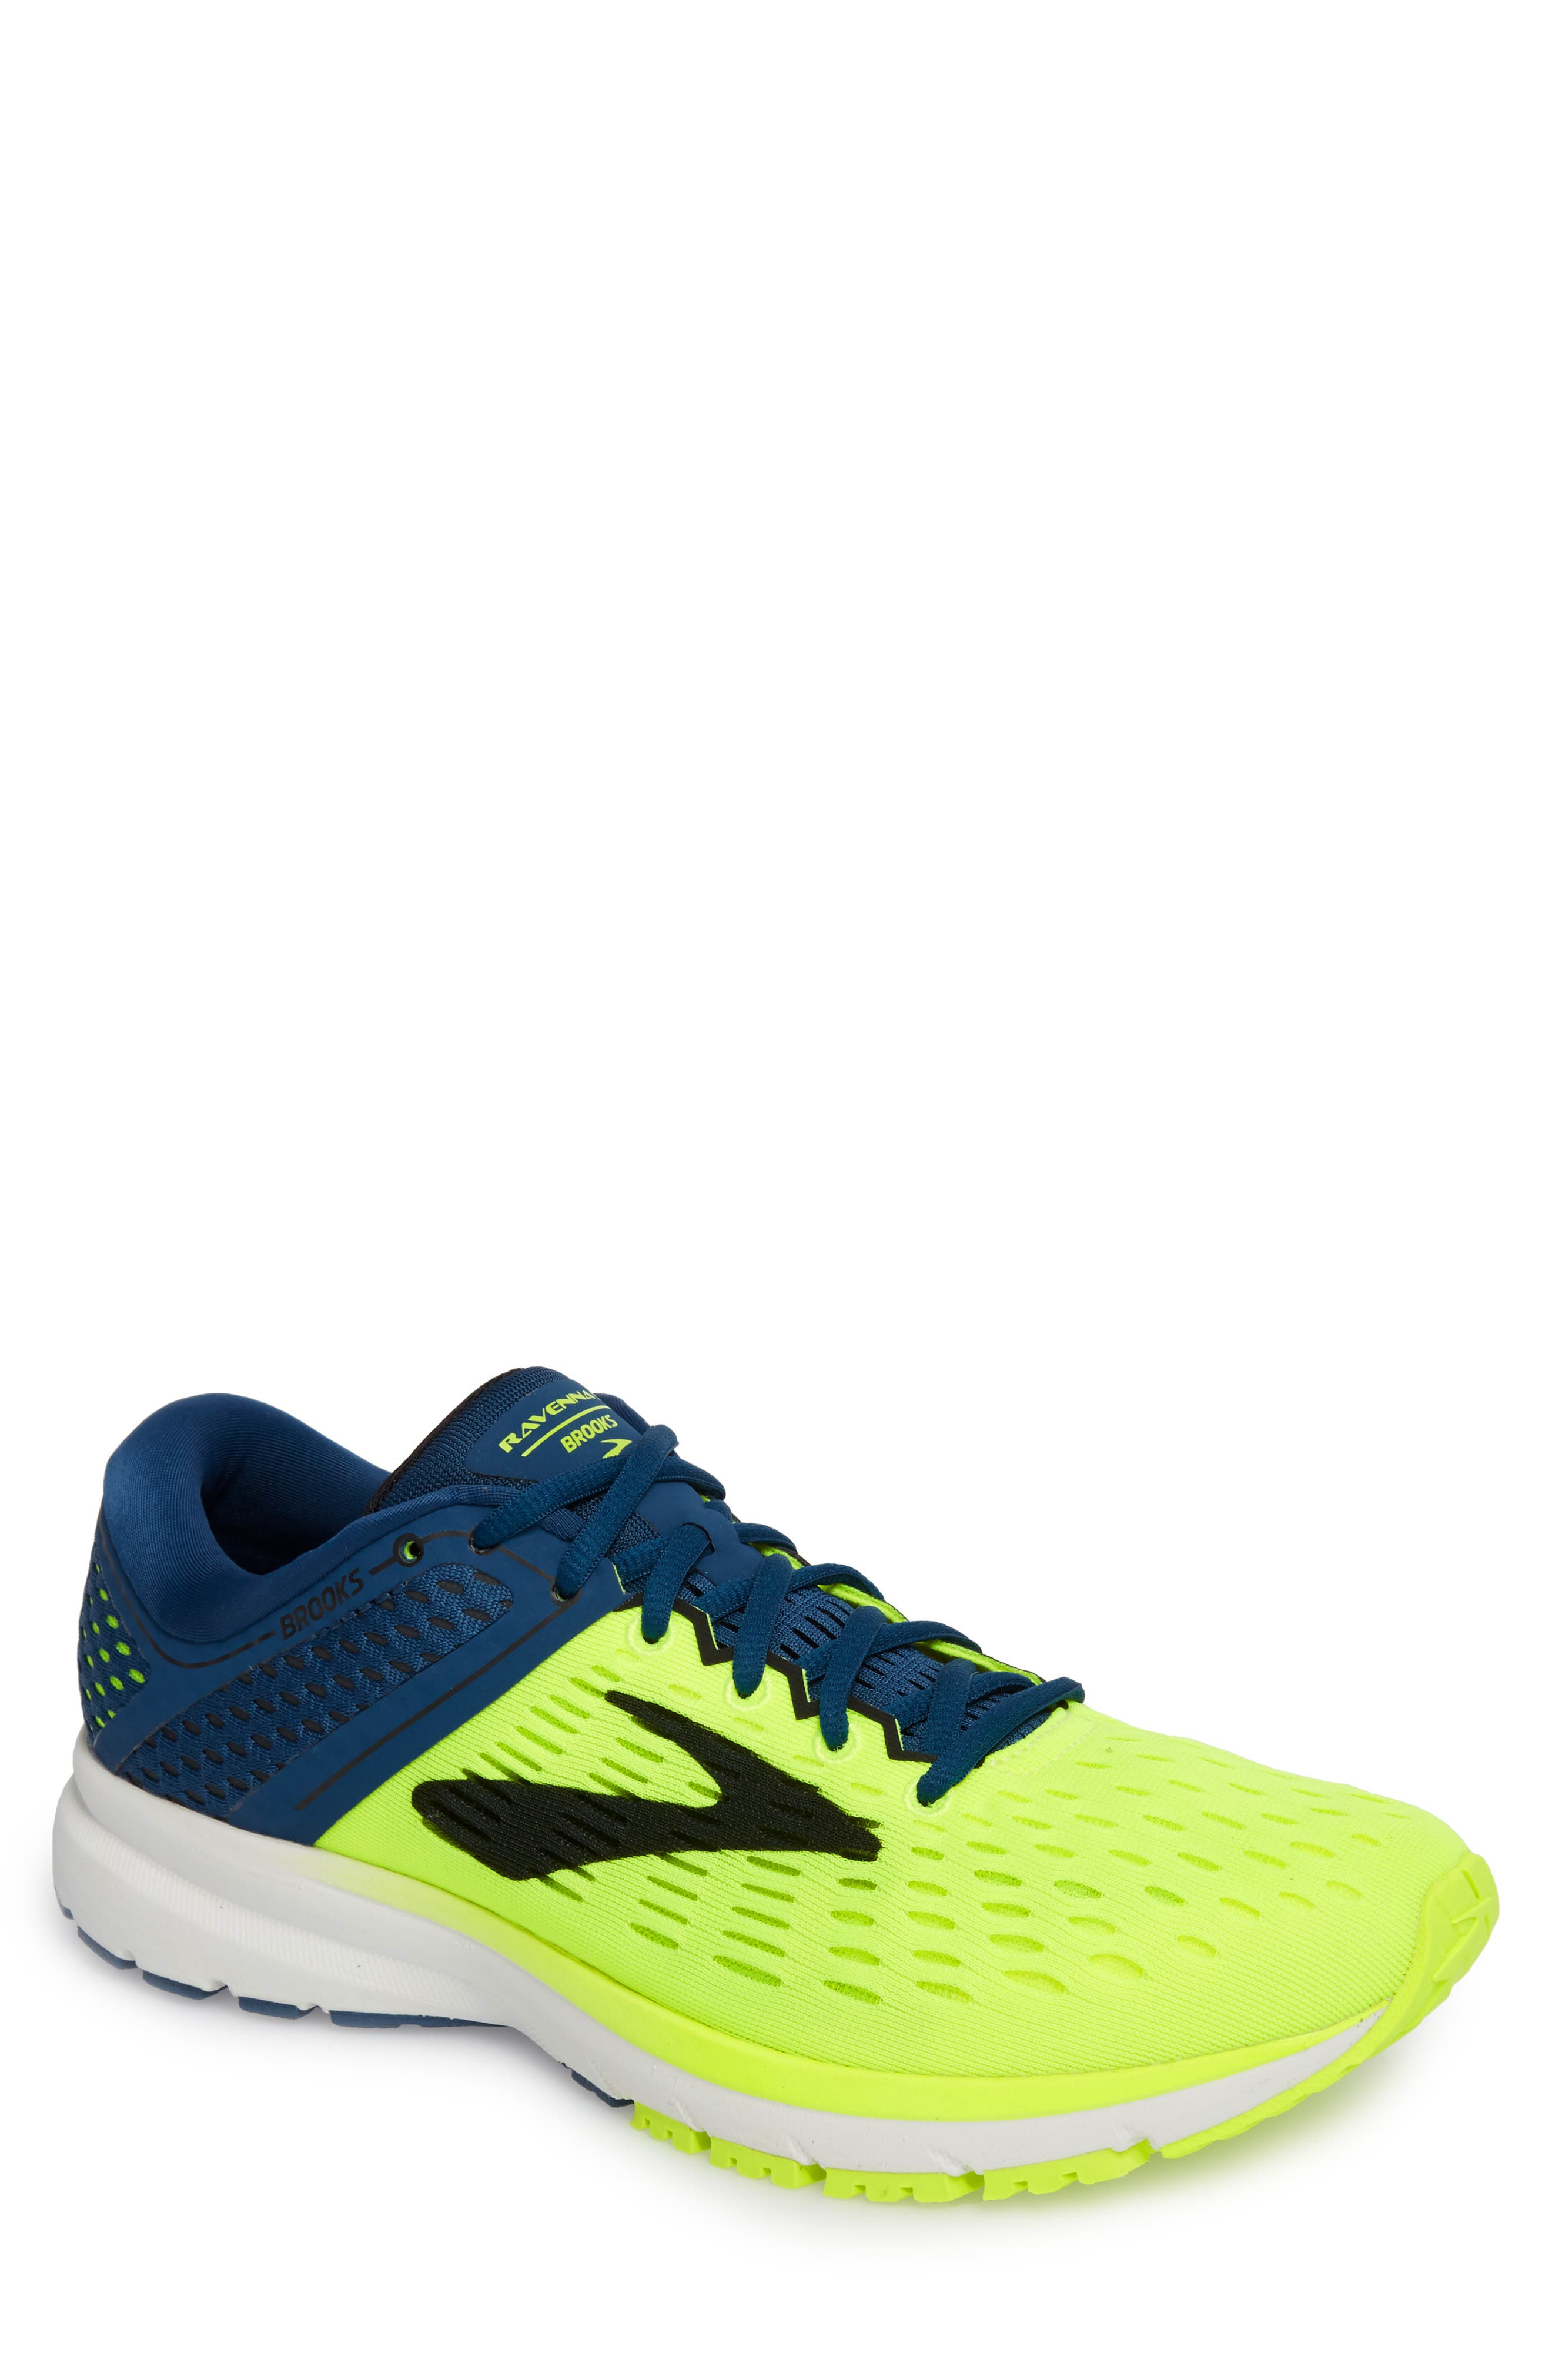 Ravenna 9 Running Shoe,                         Main,                         color, Nightlife/ Blue/ Black